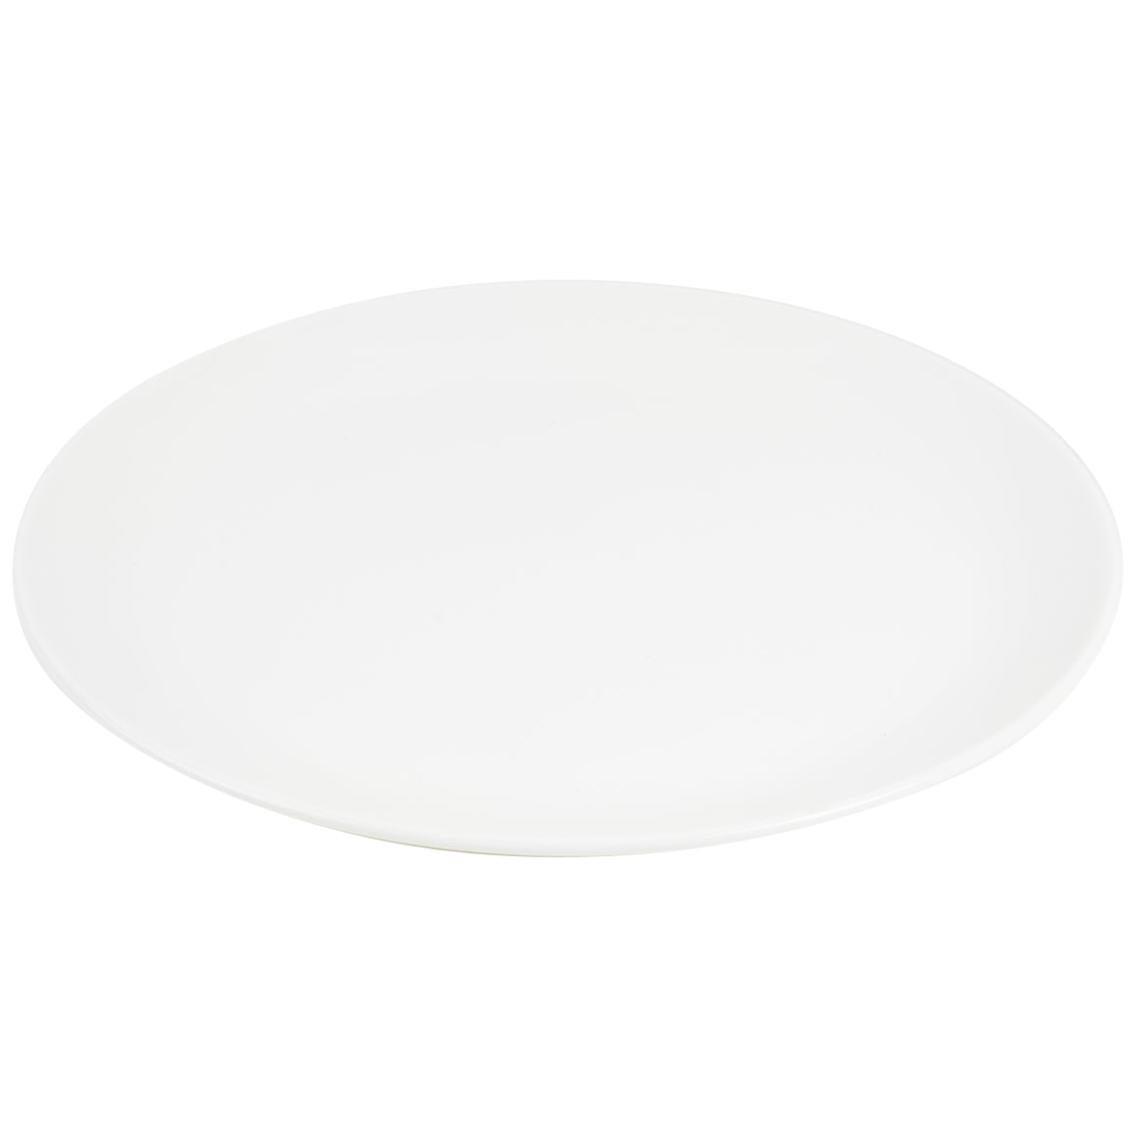 White Fine Bone China Dinner Plate